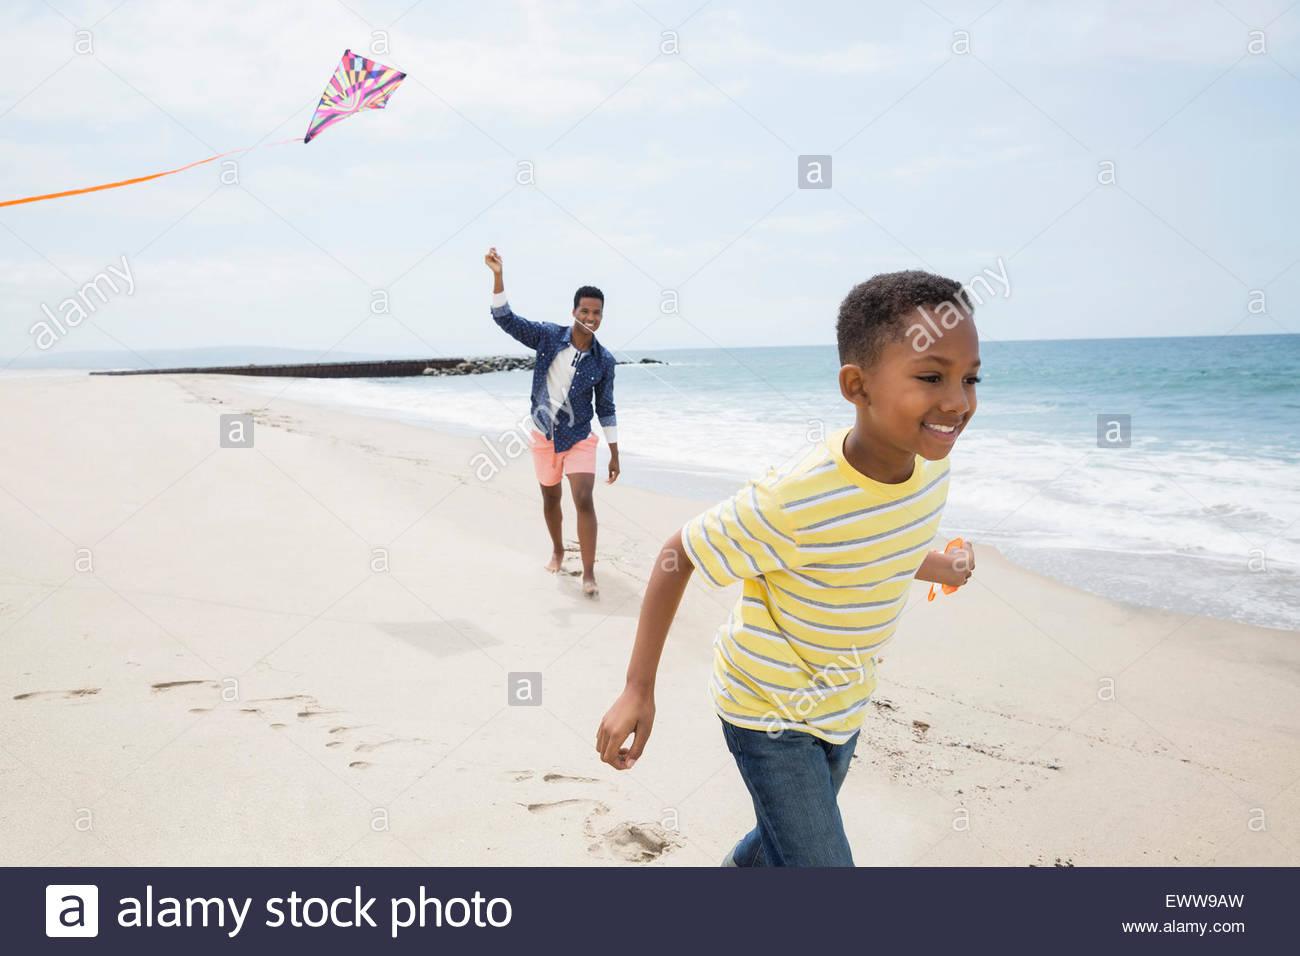 Vater und Sohn fliegen Kite am Strand Stockbild